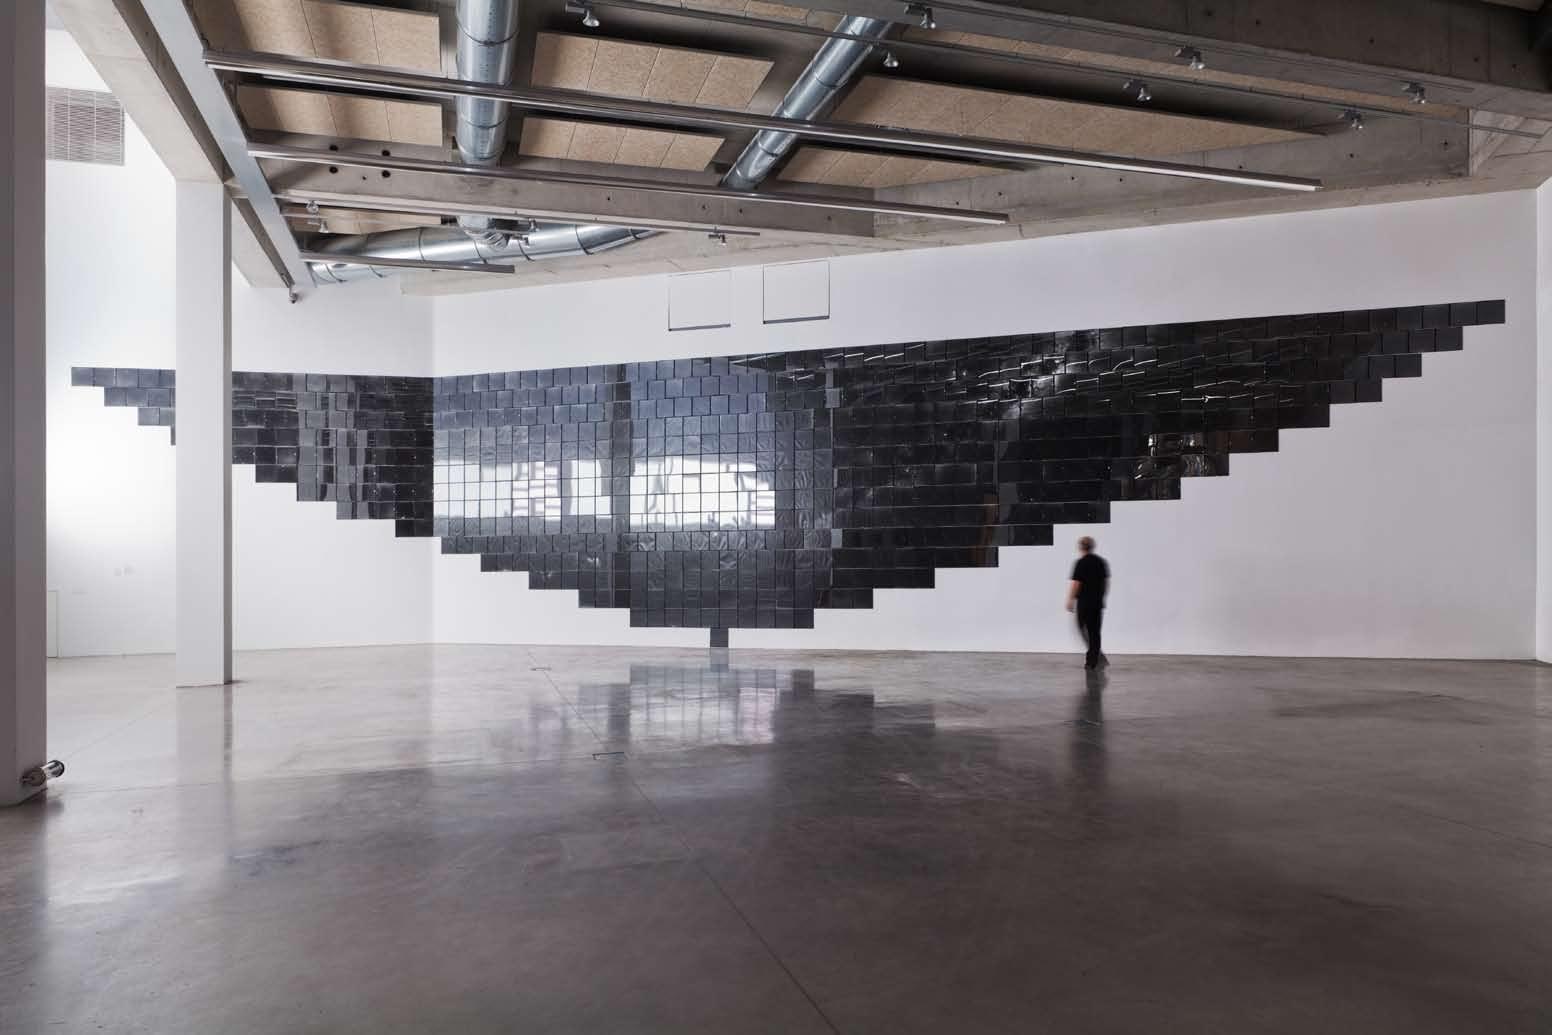 Le Grand Miroir Noir, FRAC PACA, Marseille, 2013